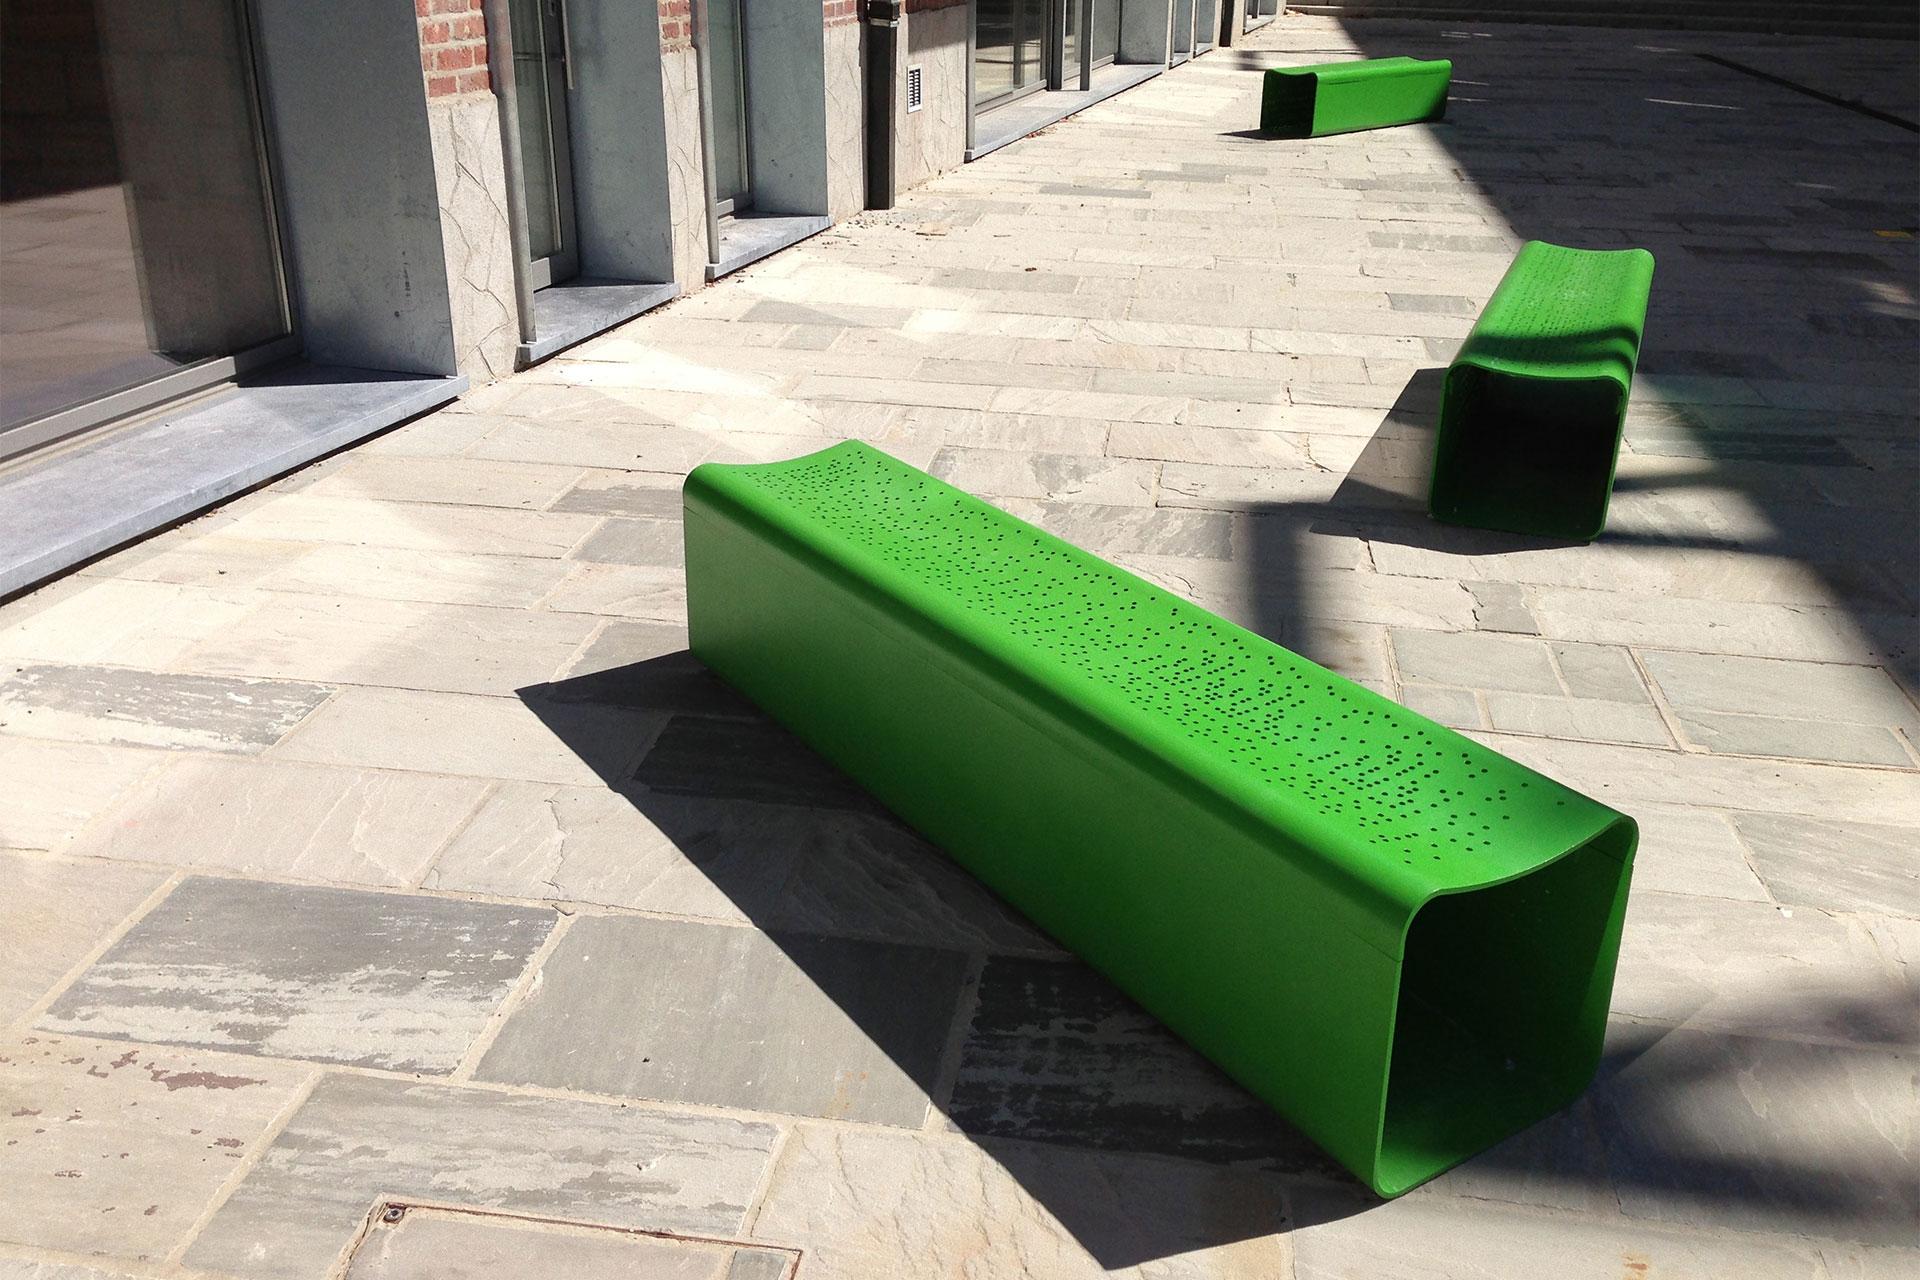 UrbanObjekts Rua Sitzgelegenheit